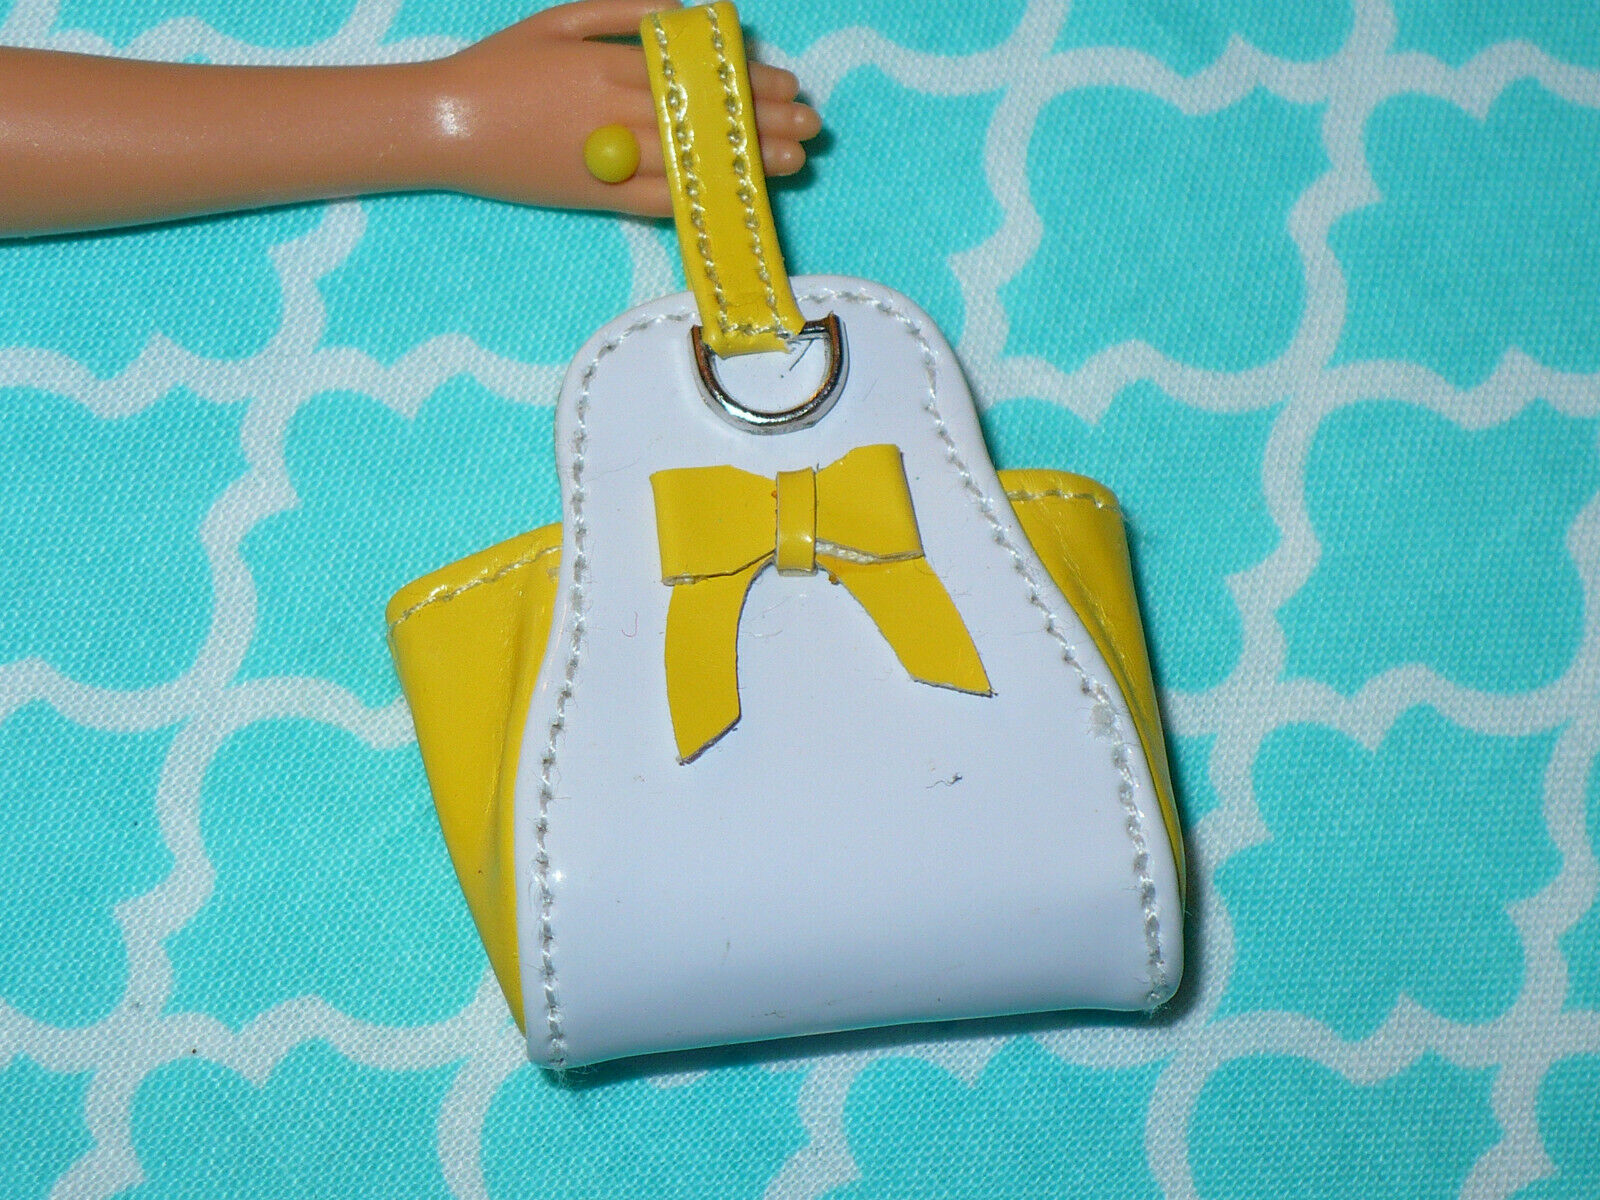 Barbie Doll DESIGNER REALISTIC YELLOW WHITE PURSE Fashion Royalty Integrity  - $31.99